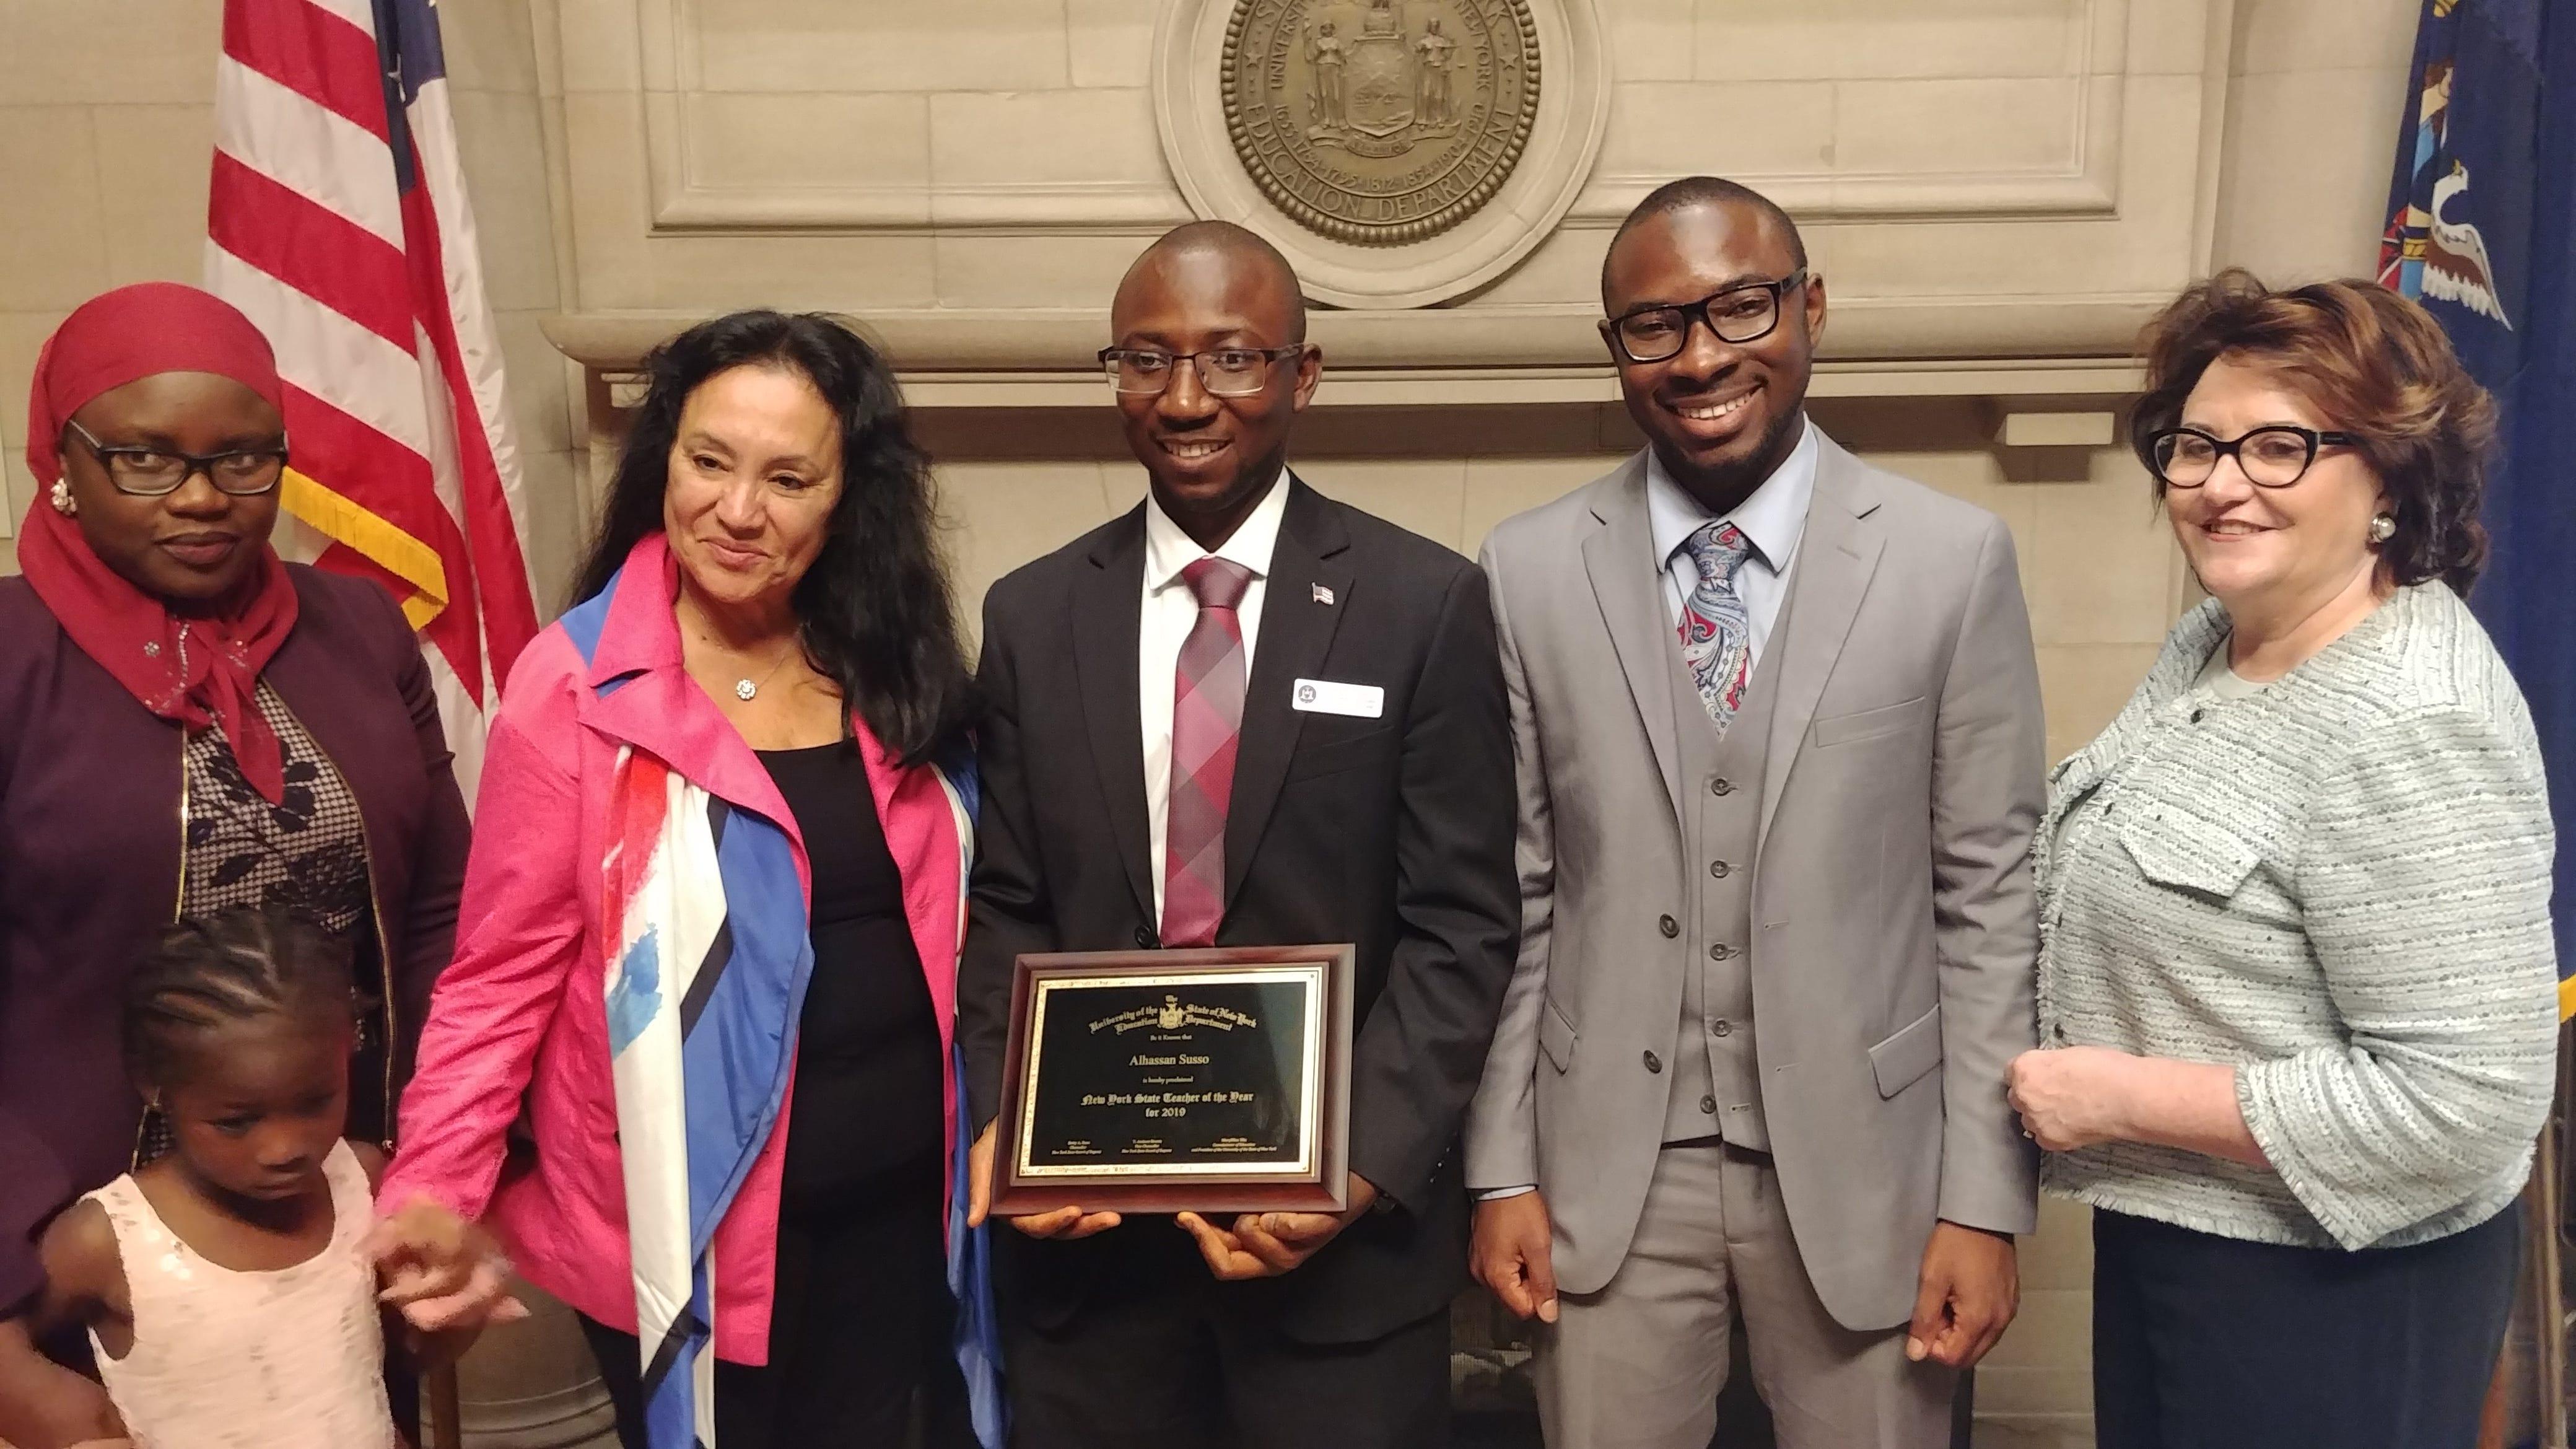 Poughkeepsie man who teaches in the Bronx named Teacher of the Year